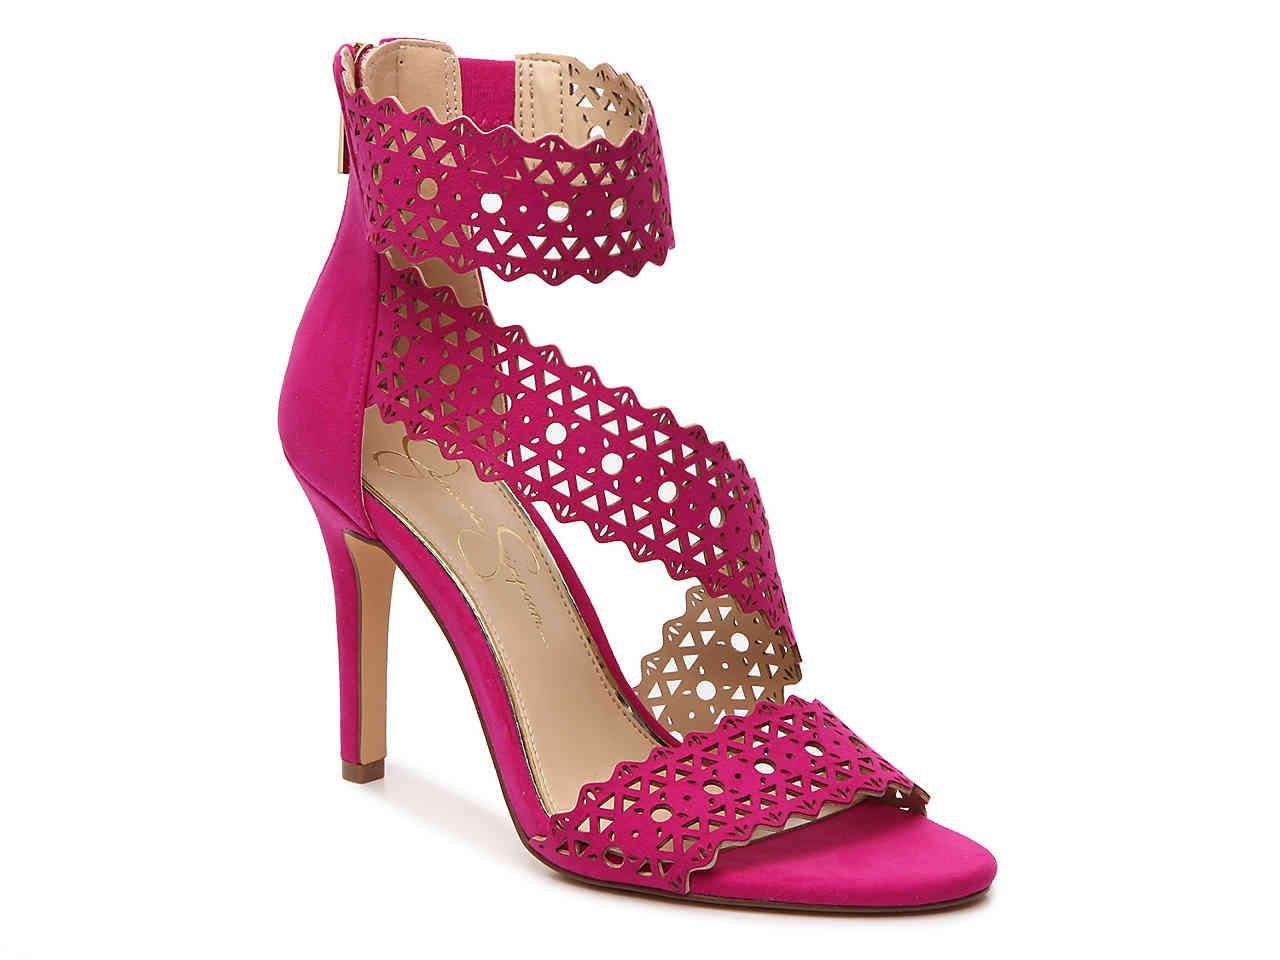 78087754cb19 Jessica Simpson Purple Shoes Dsw - Style Guru  Fashion